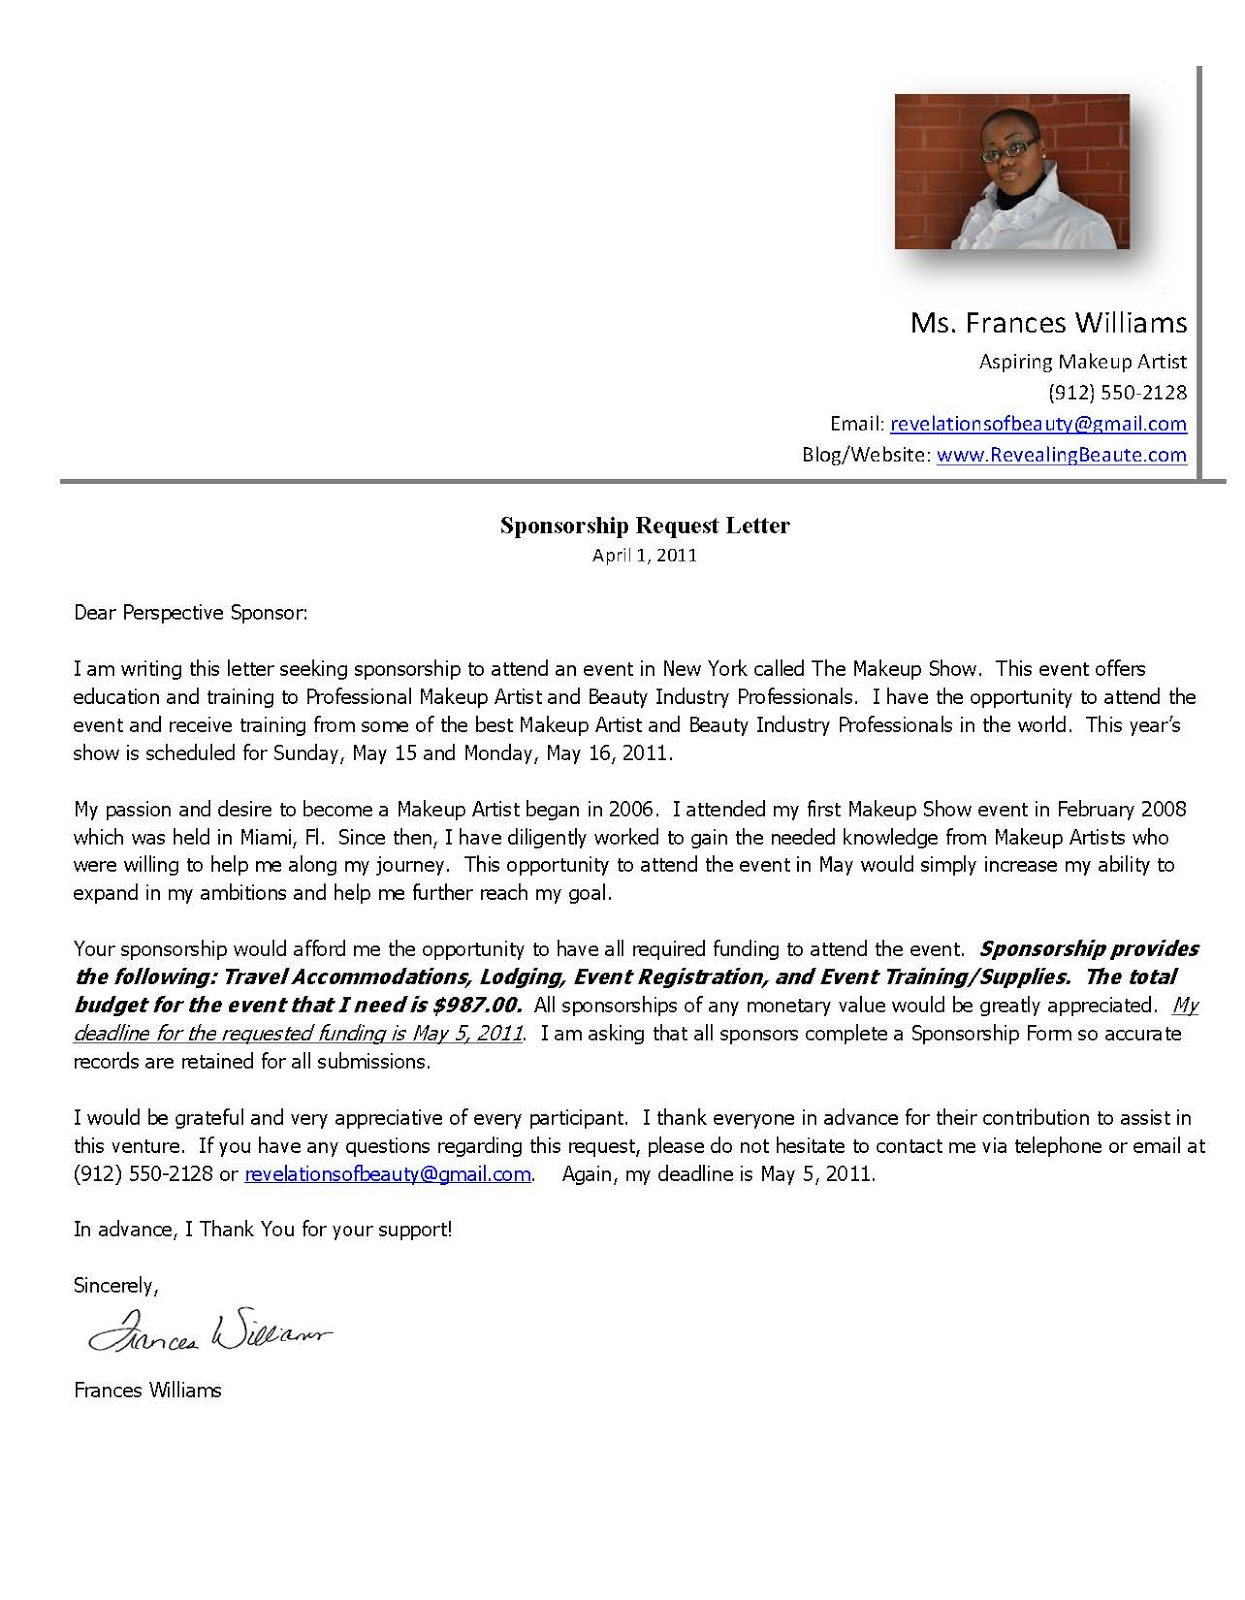 sponsorship request letter template Success